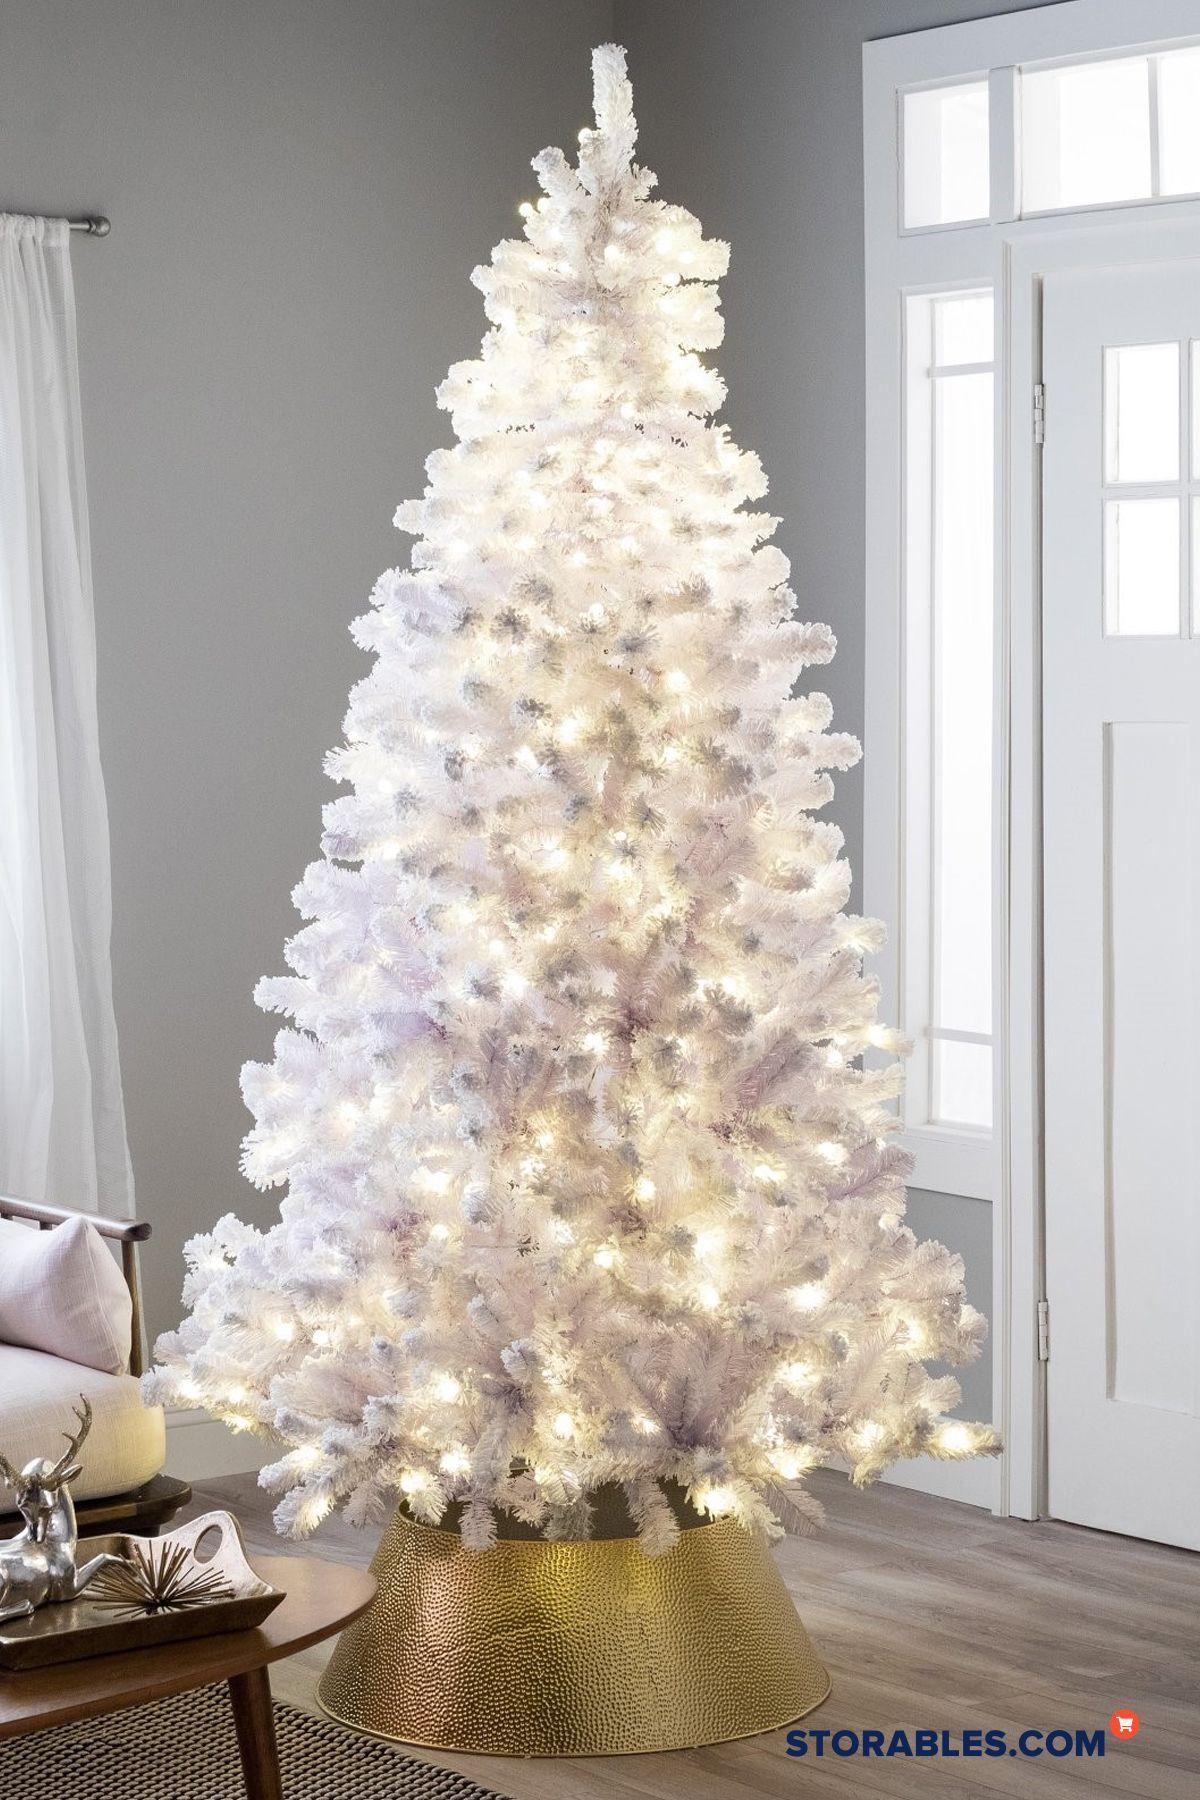 10 Stunning White Christmas Tree Decor Ideas Pre Lit Christmas Tree White Christmas Tree Decorations White Xmas Tree